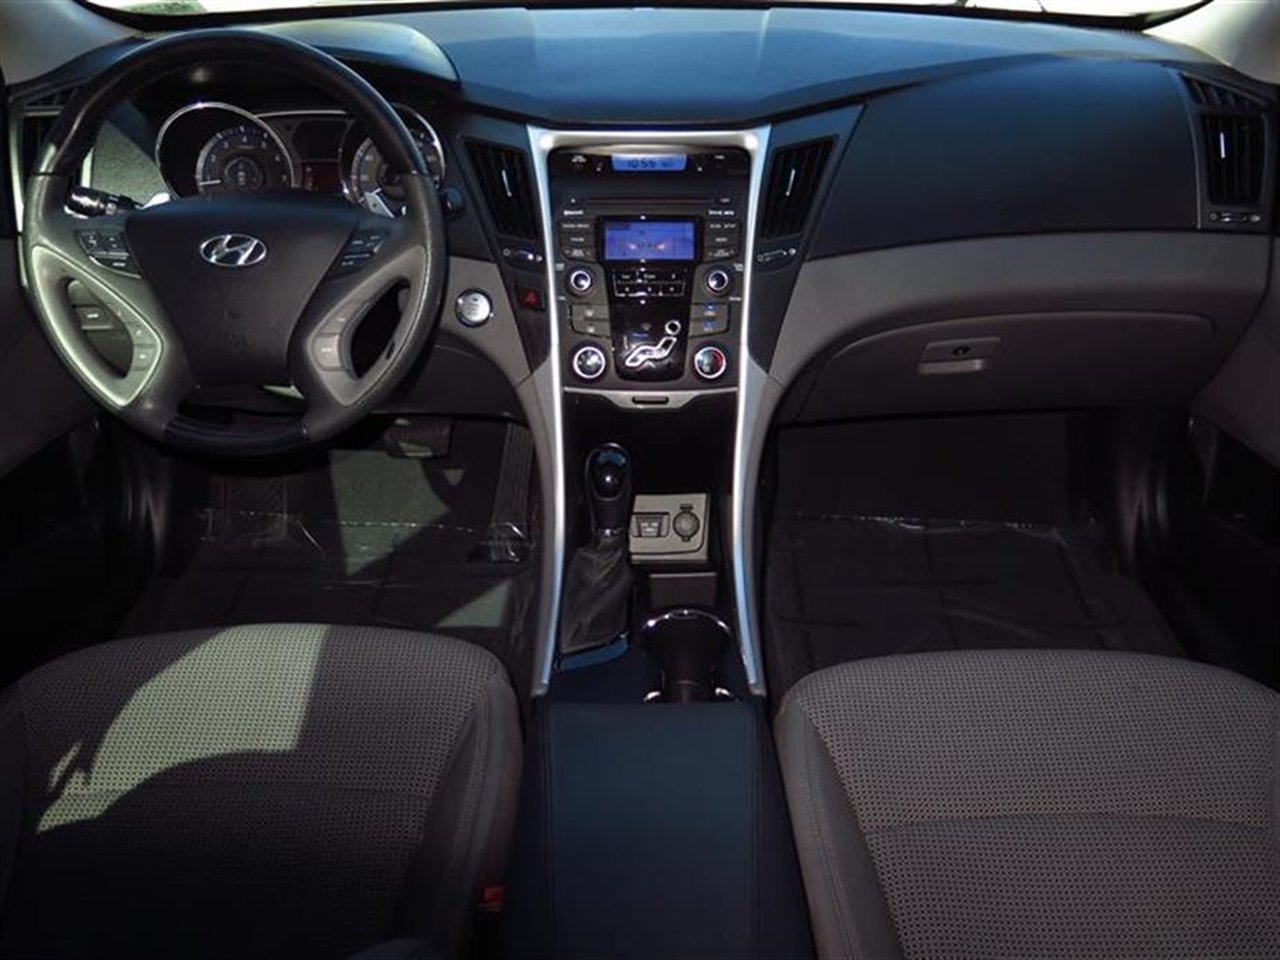 2013 HYUNDAI SONATA 4dr Sdn 24L Auto GLS Ltd Avail 46839 miles 2 center console mounted 12-